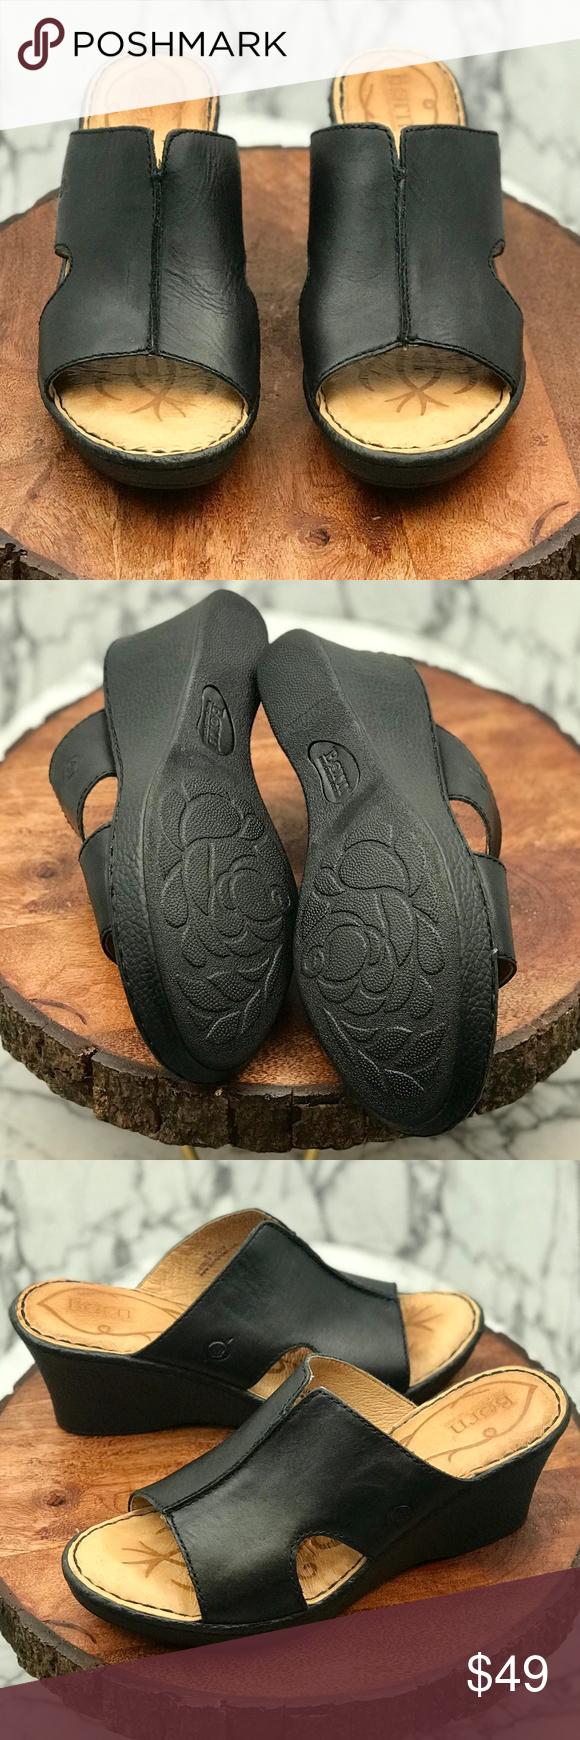 407da22bffc Born Bernt Women s Wedge Shoes Size 8 Born Bernt Women s Wedge Shoes -  Condition  Used     Excellent Condition     - Size  8 - Color  Black   Pet    Smoke ...